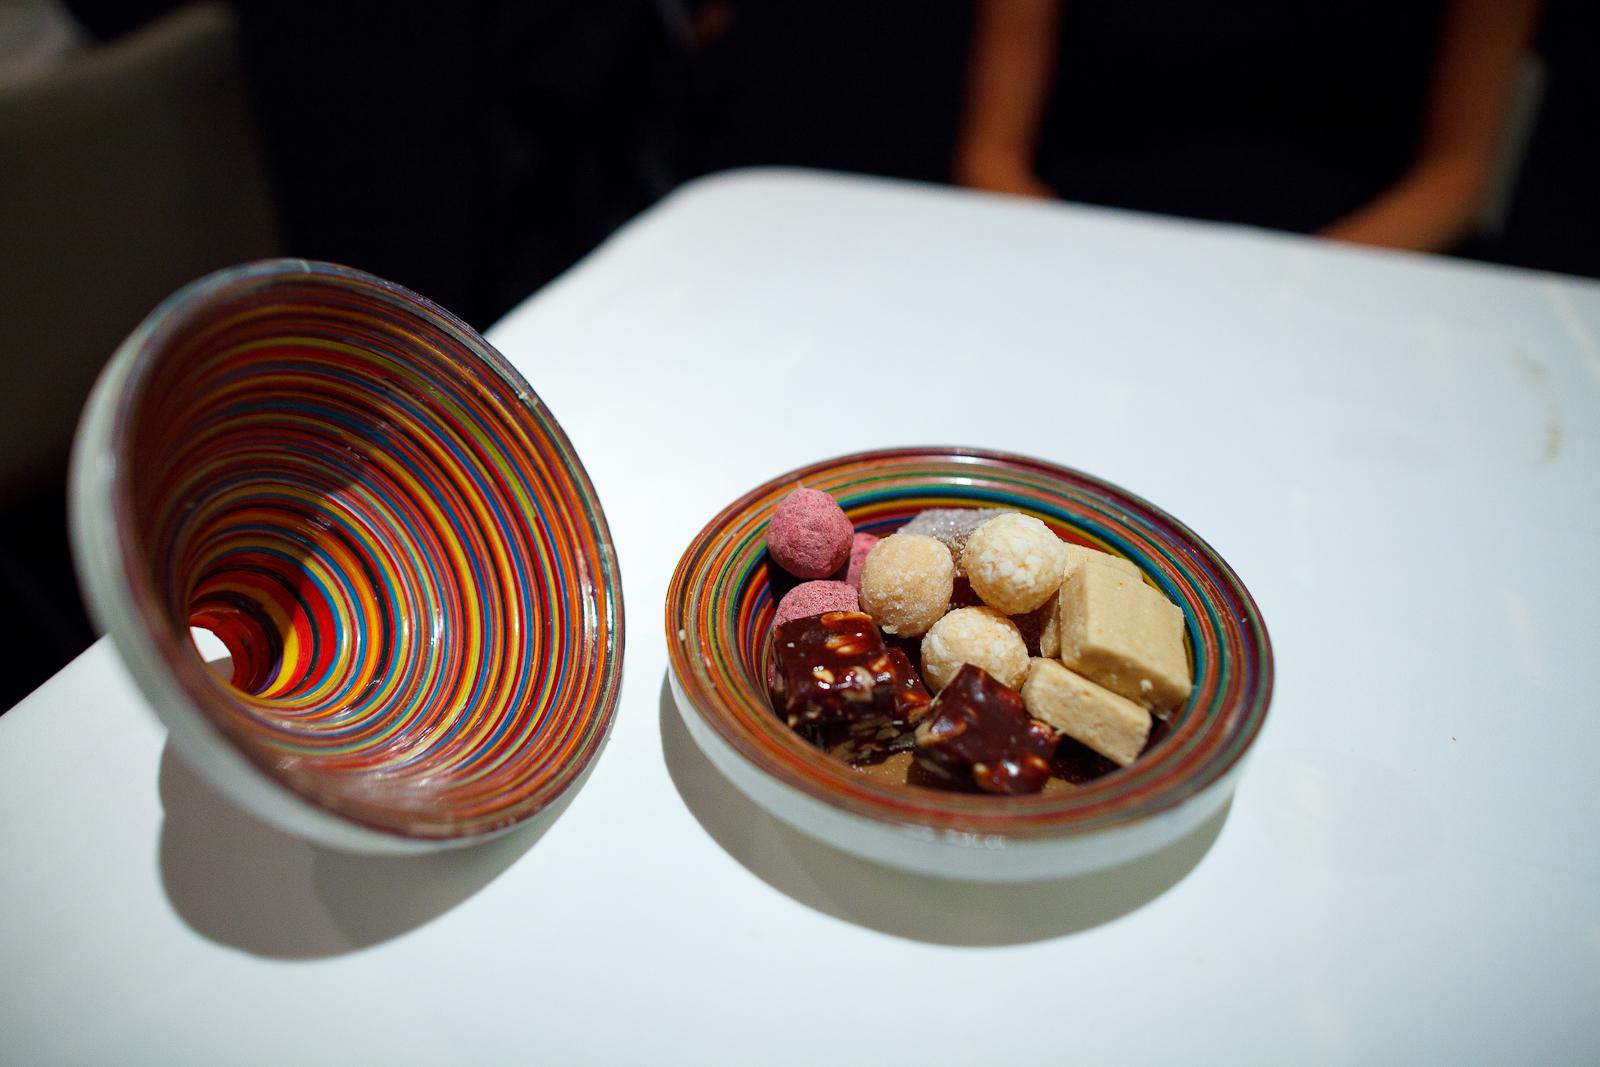 Amuses bouches: chocolate de caramelo con cacahuate, cocada, mazapán, trufa de chocolate oaxaqueño con jamaica, gomita de tamarindo